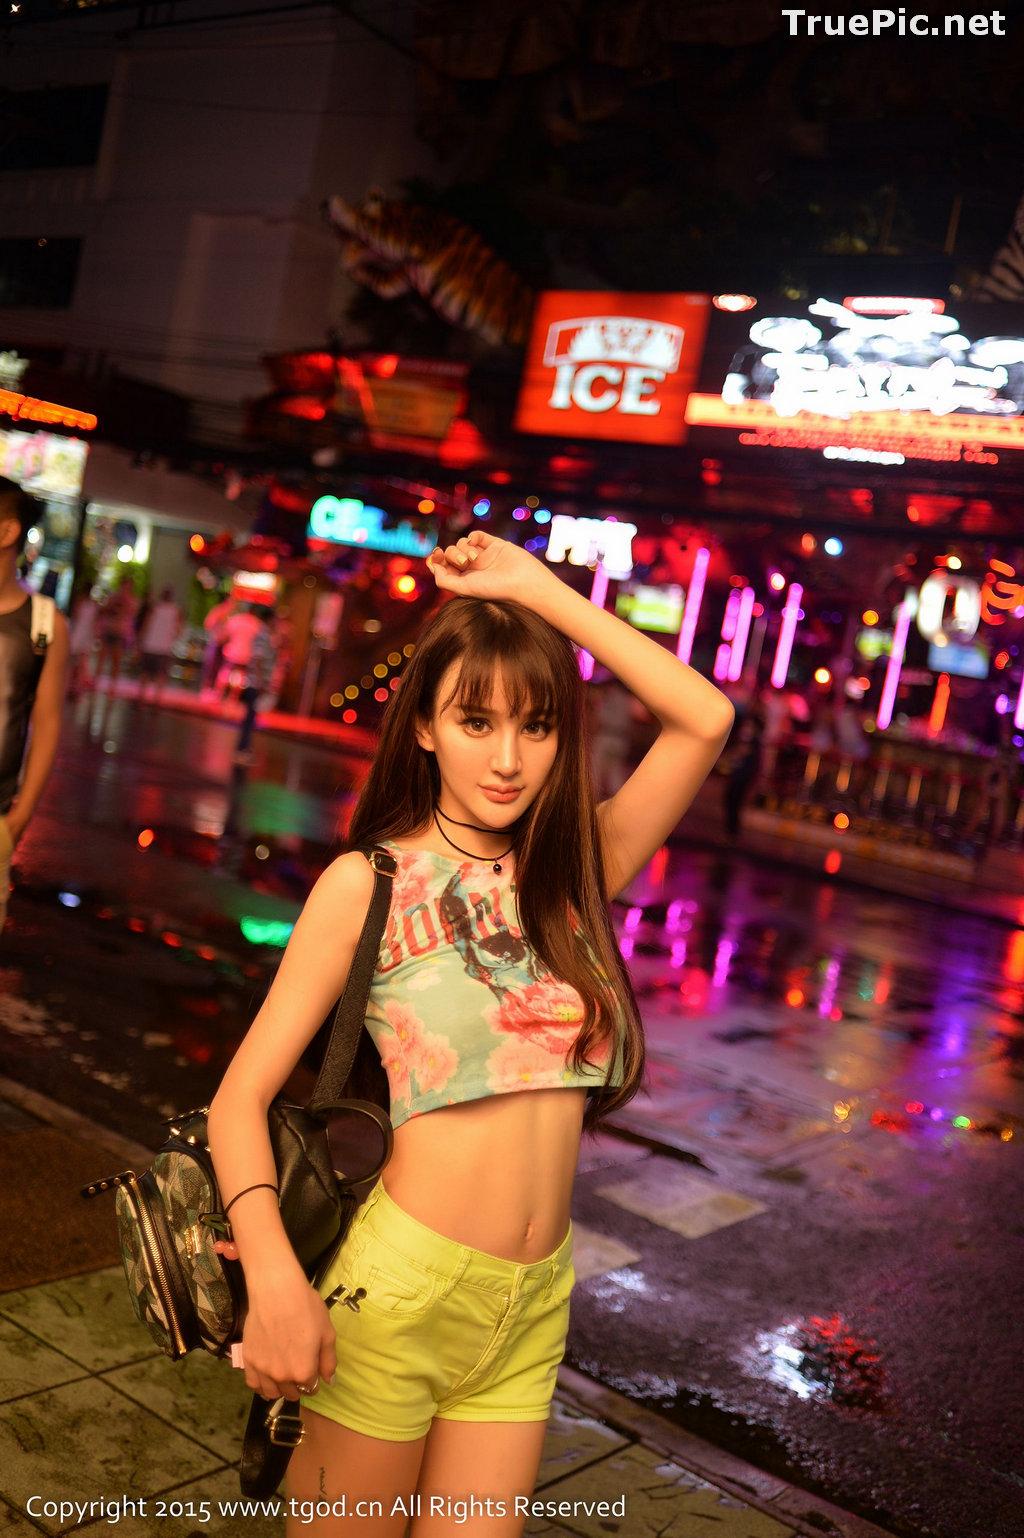 Image TGOD 2015-11-10 - Chinese Sexy Model - Cheryl (青树) - TruePic.net - Picture-21